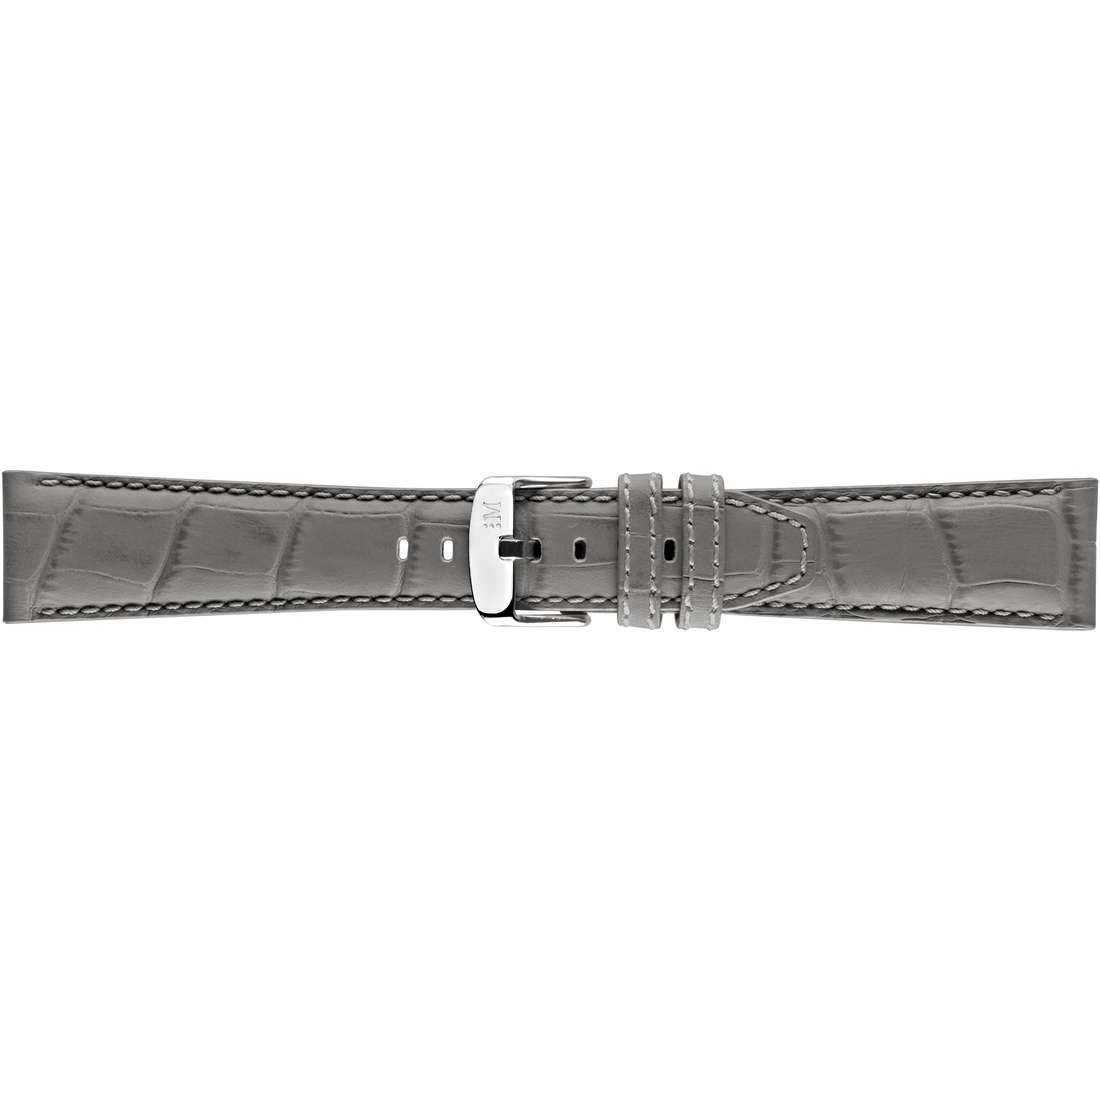 watch watch bands watch straps man Morellato Linea Sport A01X4497B44092CR22